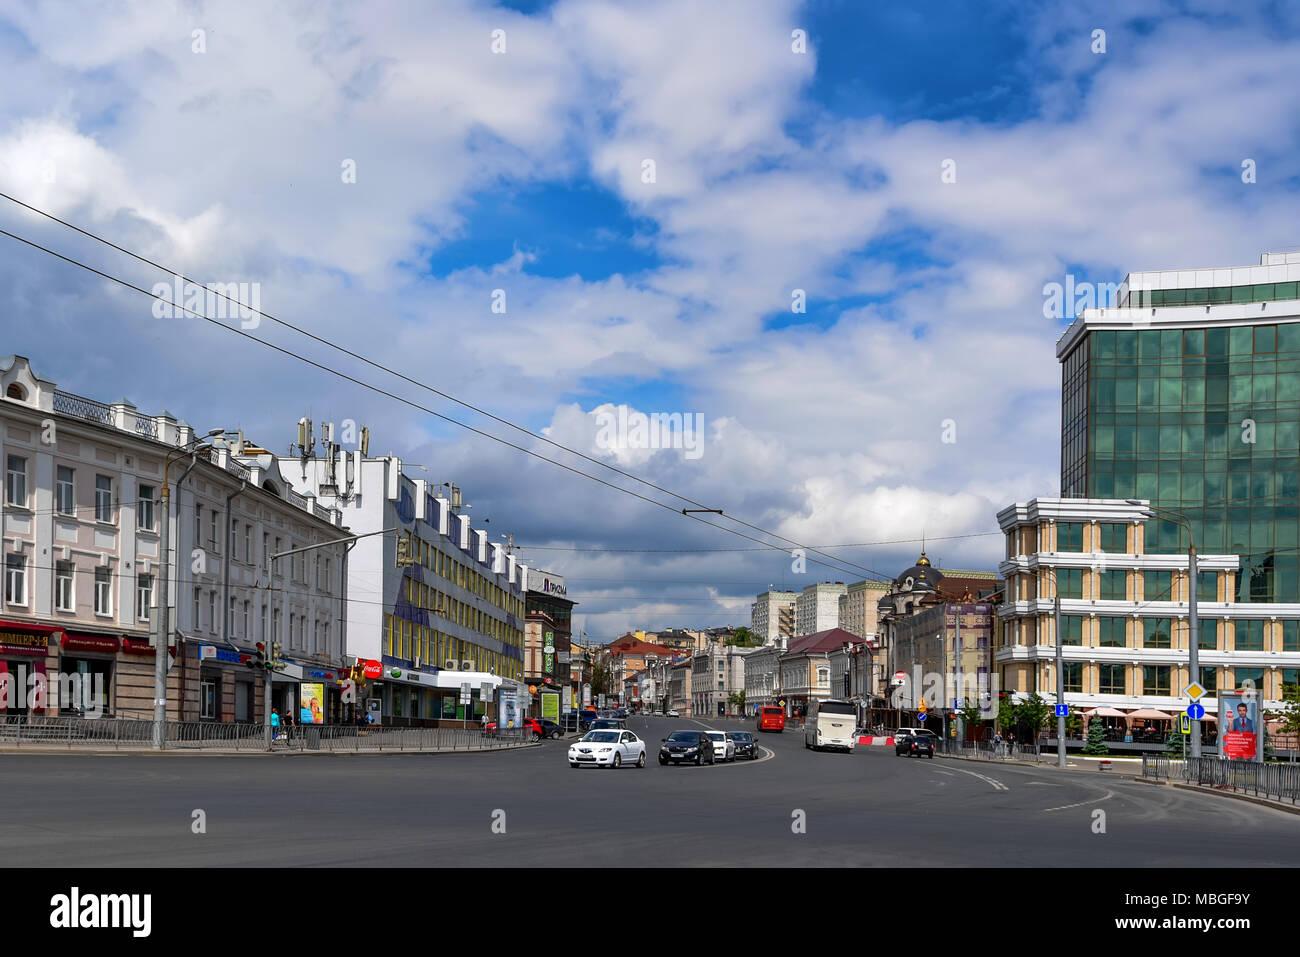 KAZAN, RUSSIA - JUNE 5, 2016: View of Kazan streets, Russia Stock Photo